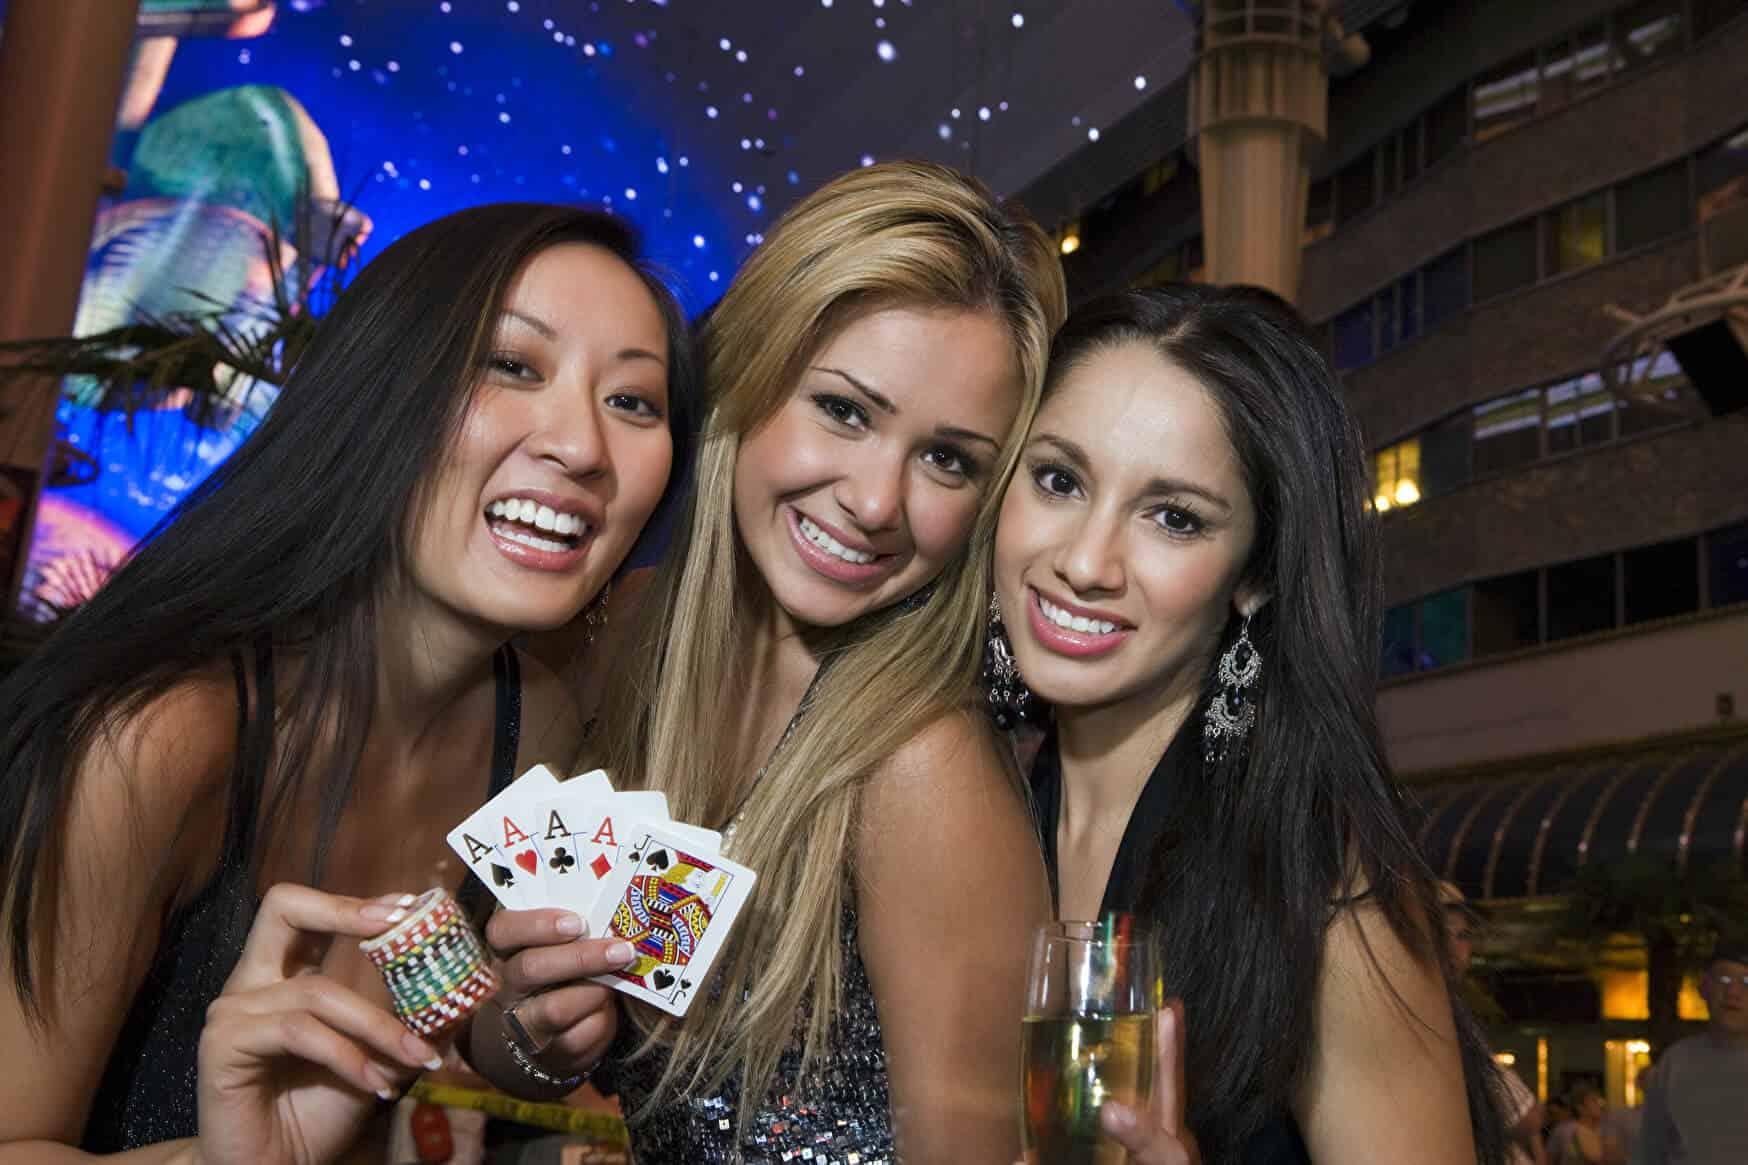 Junggesellenabschied im Casino | © PantherMedia / Craig Robinson